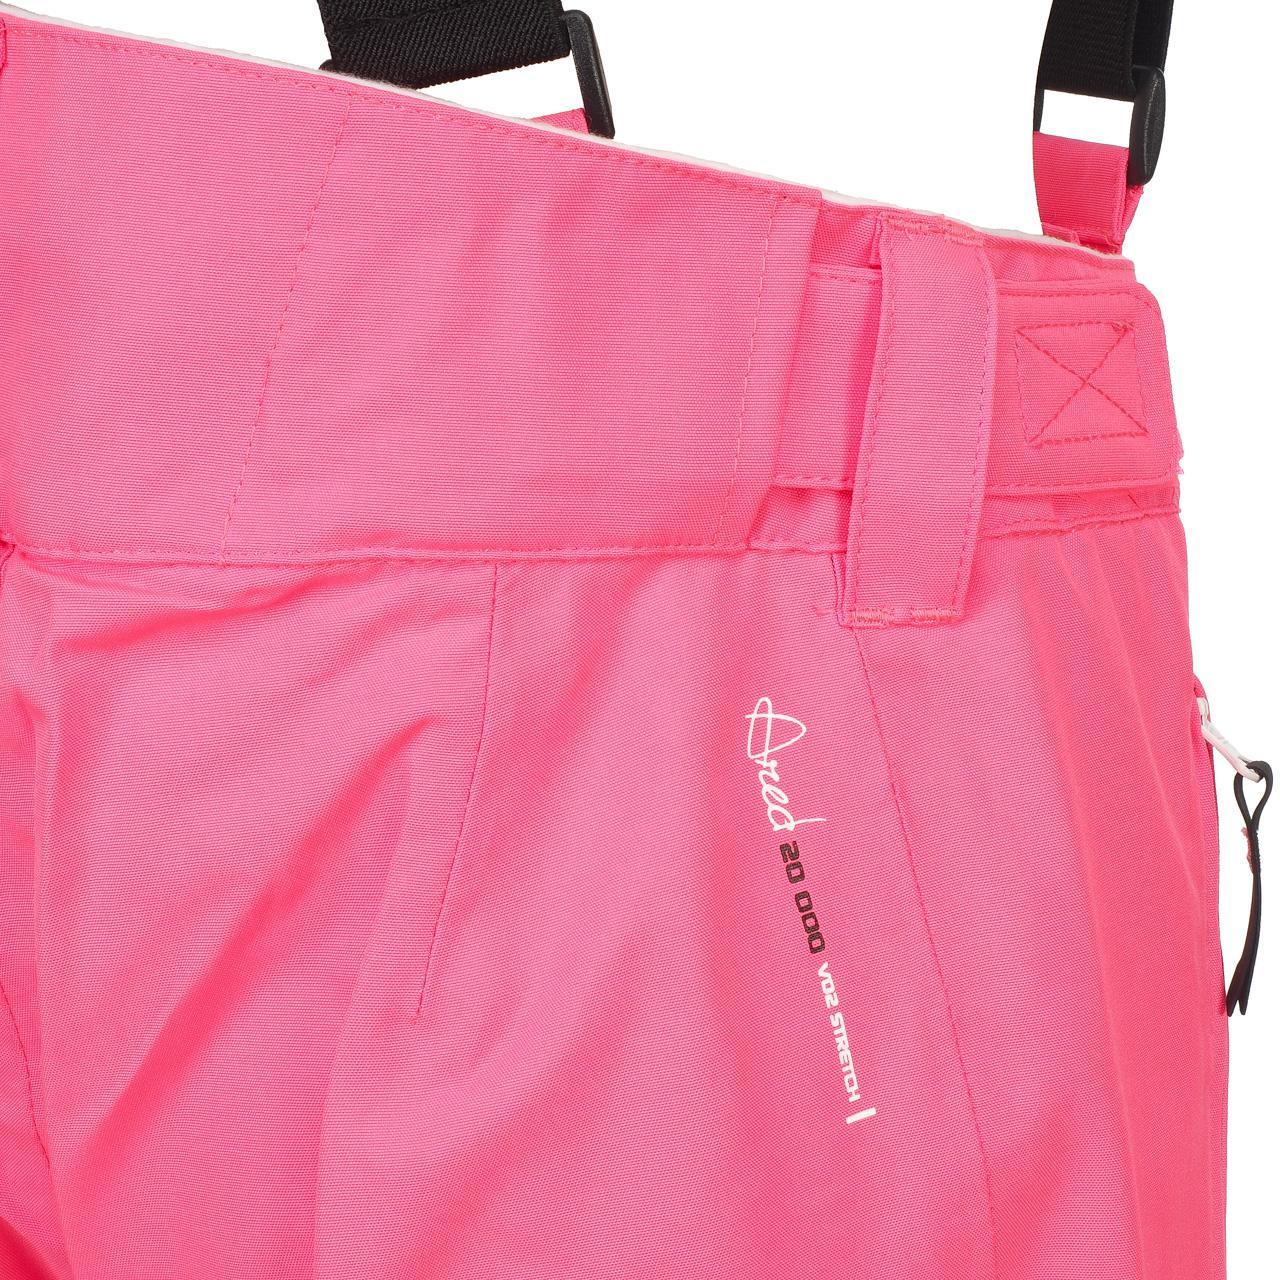 Ski-Pants-Surf-Dare-2b-Stand-for-II-Rsepantski-L-Pink-16116-New thumbnail 3